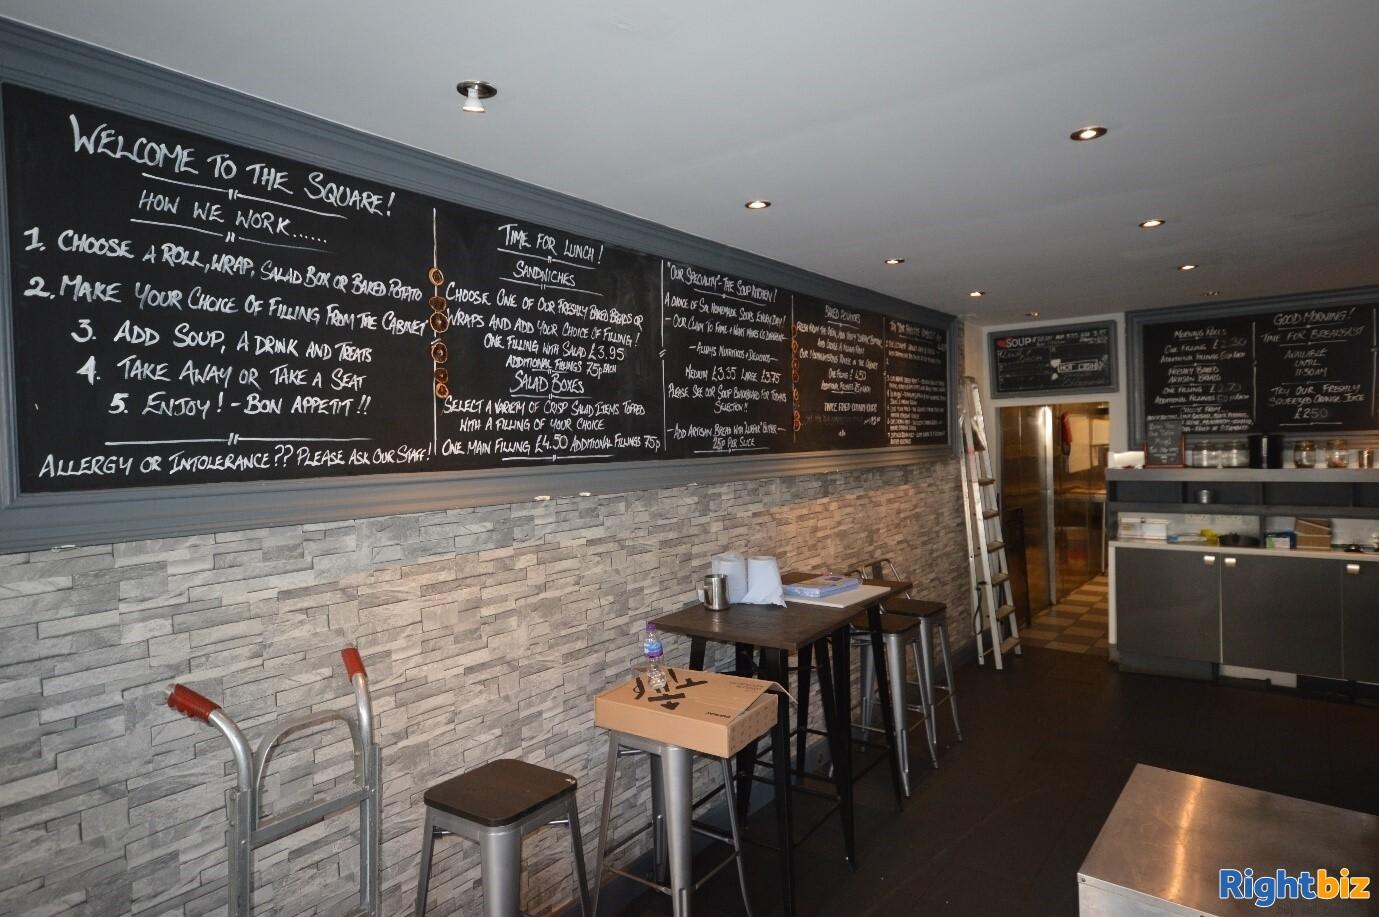 Full Class 3 hot food takeaway in Edinburgh city centre (ref 1396) - Image 4